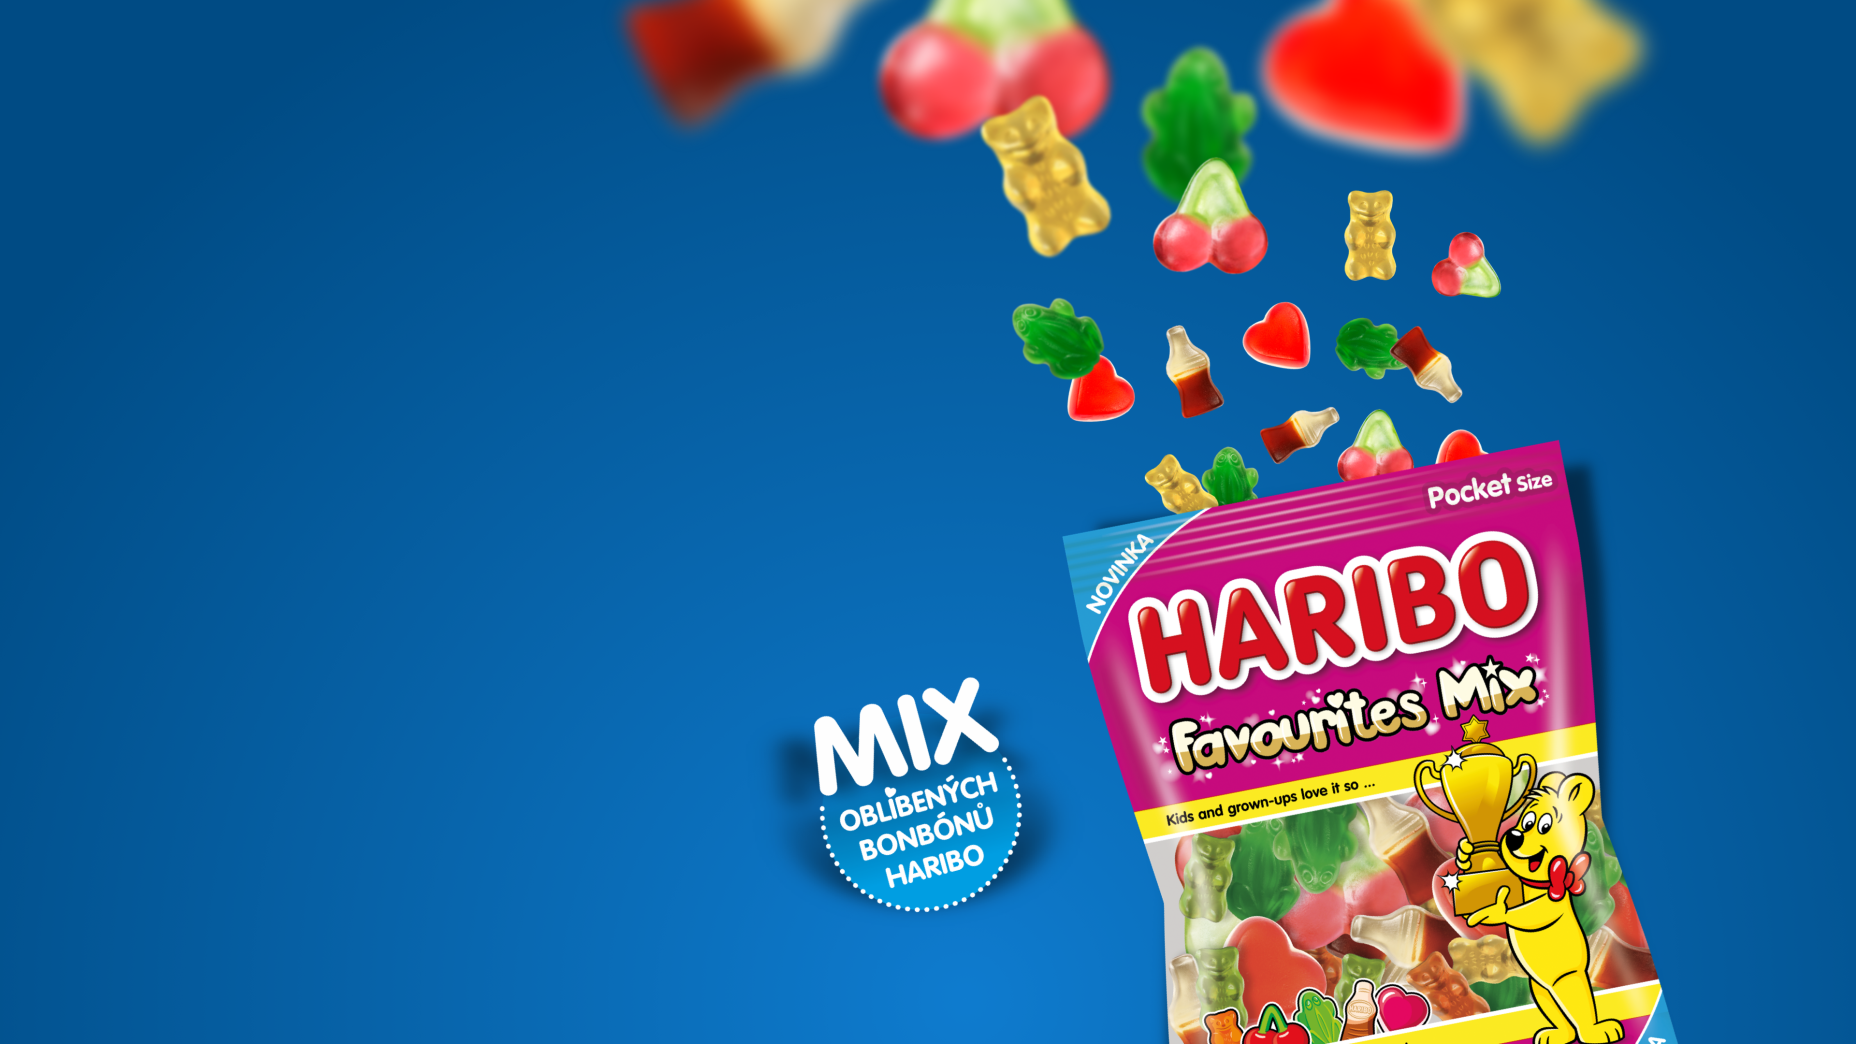 Haribo Favourites Mix Cover 3840x2160 CZ